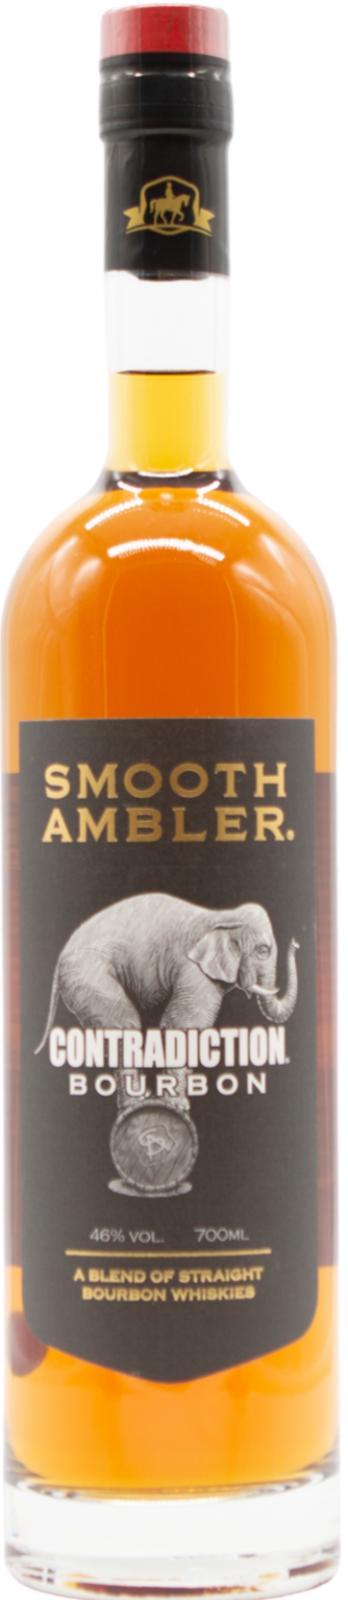 Smooth Ambler Contradiction